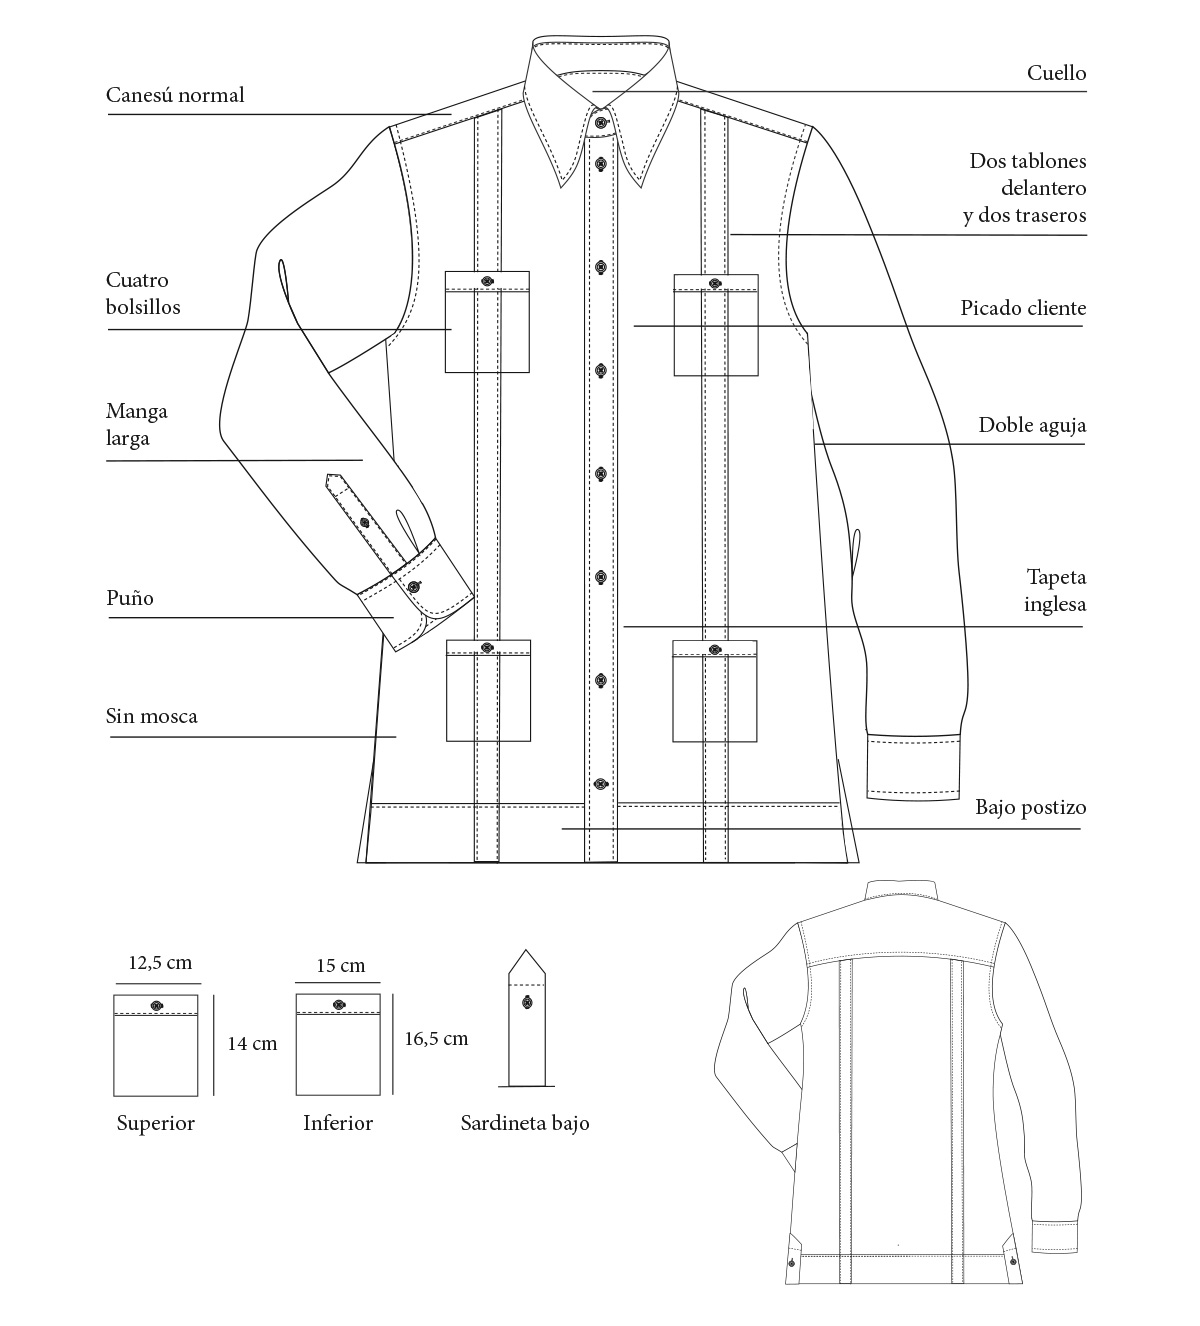 Camisa habanera / Guayabera